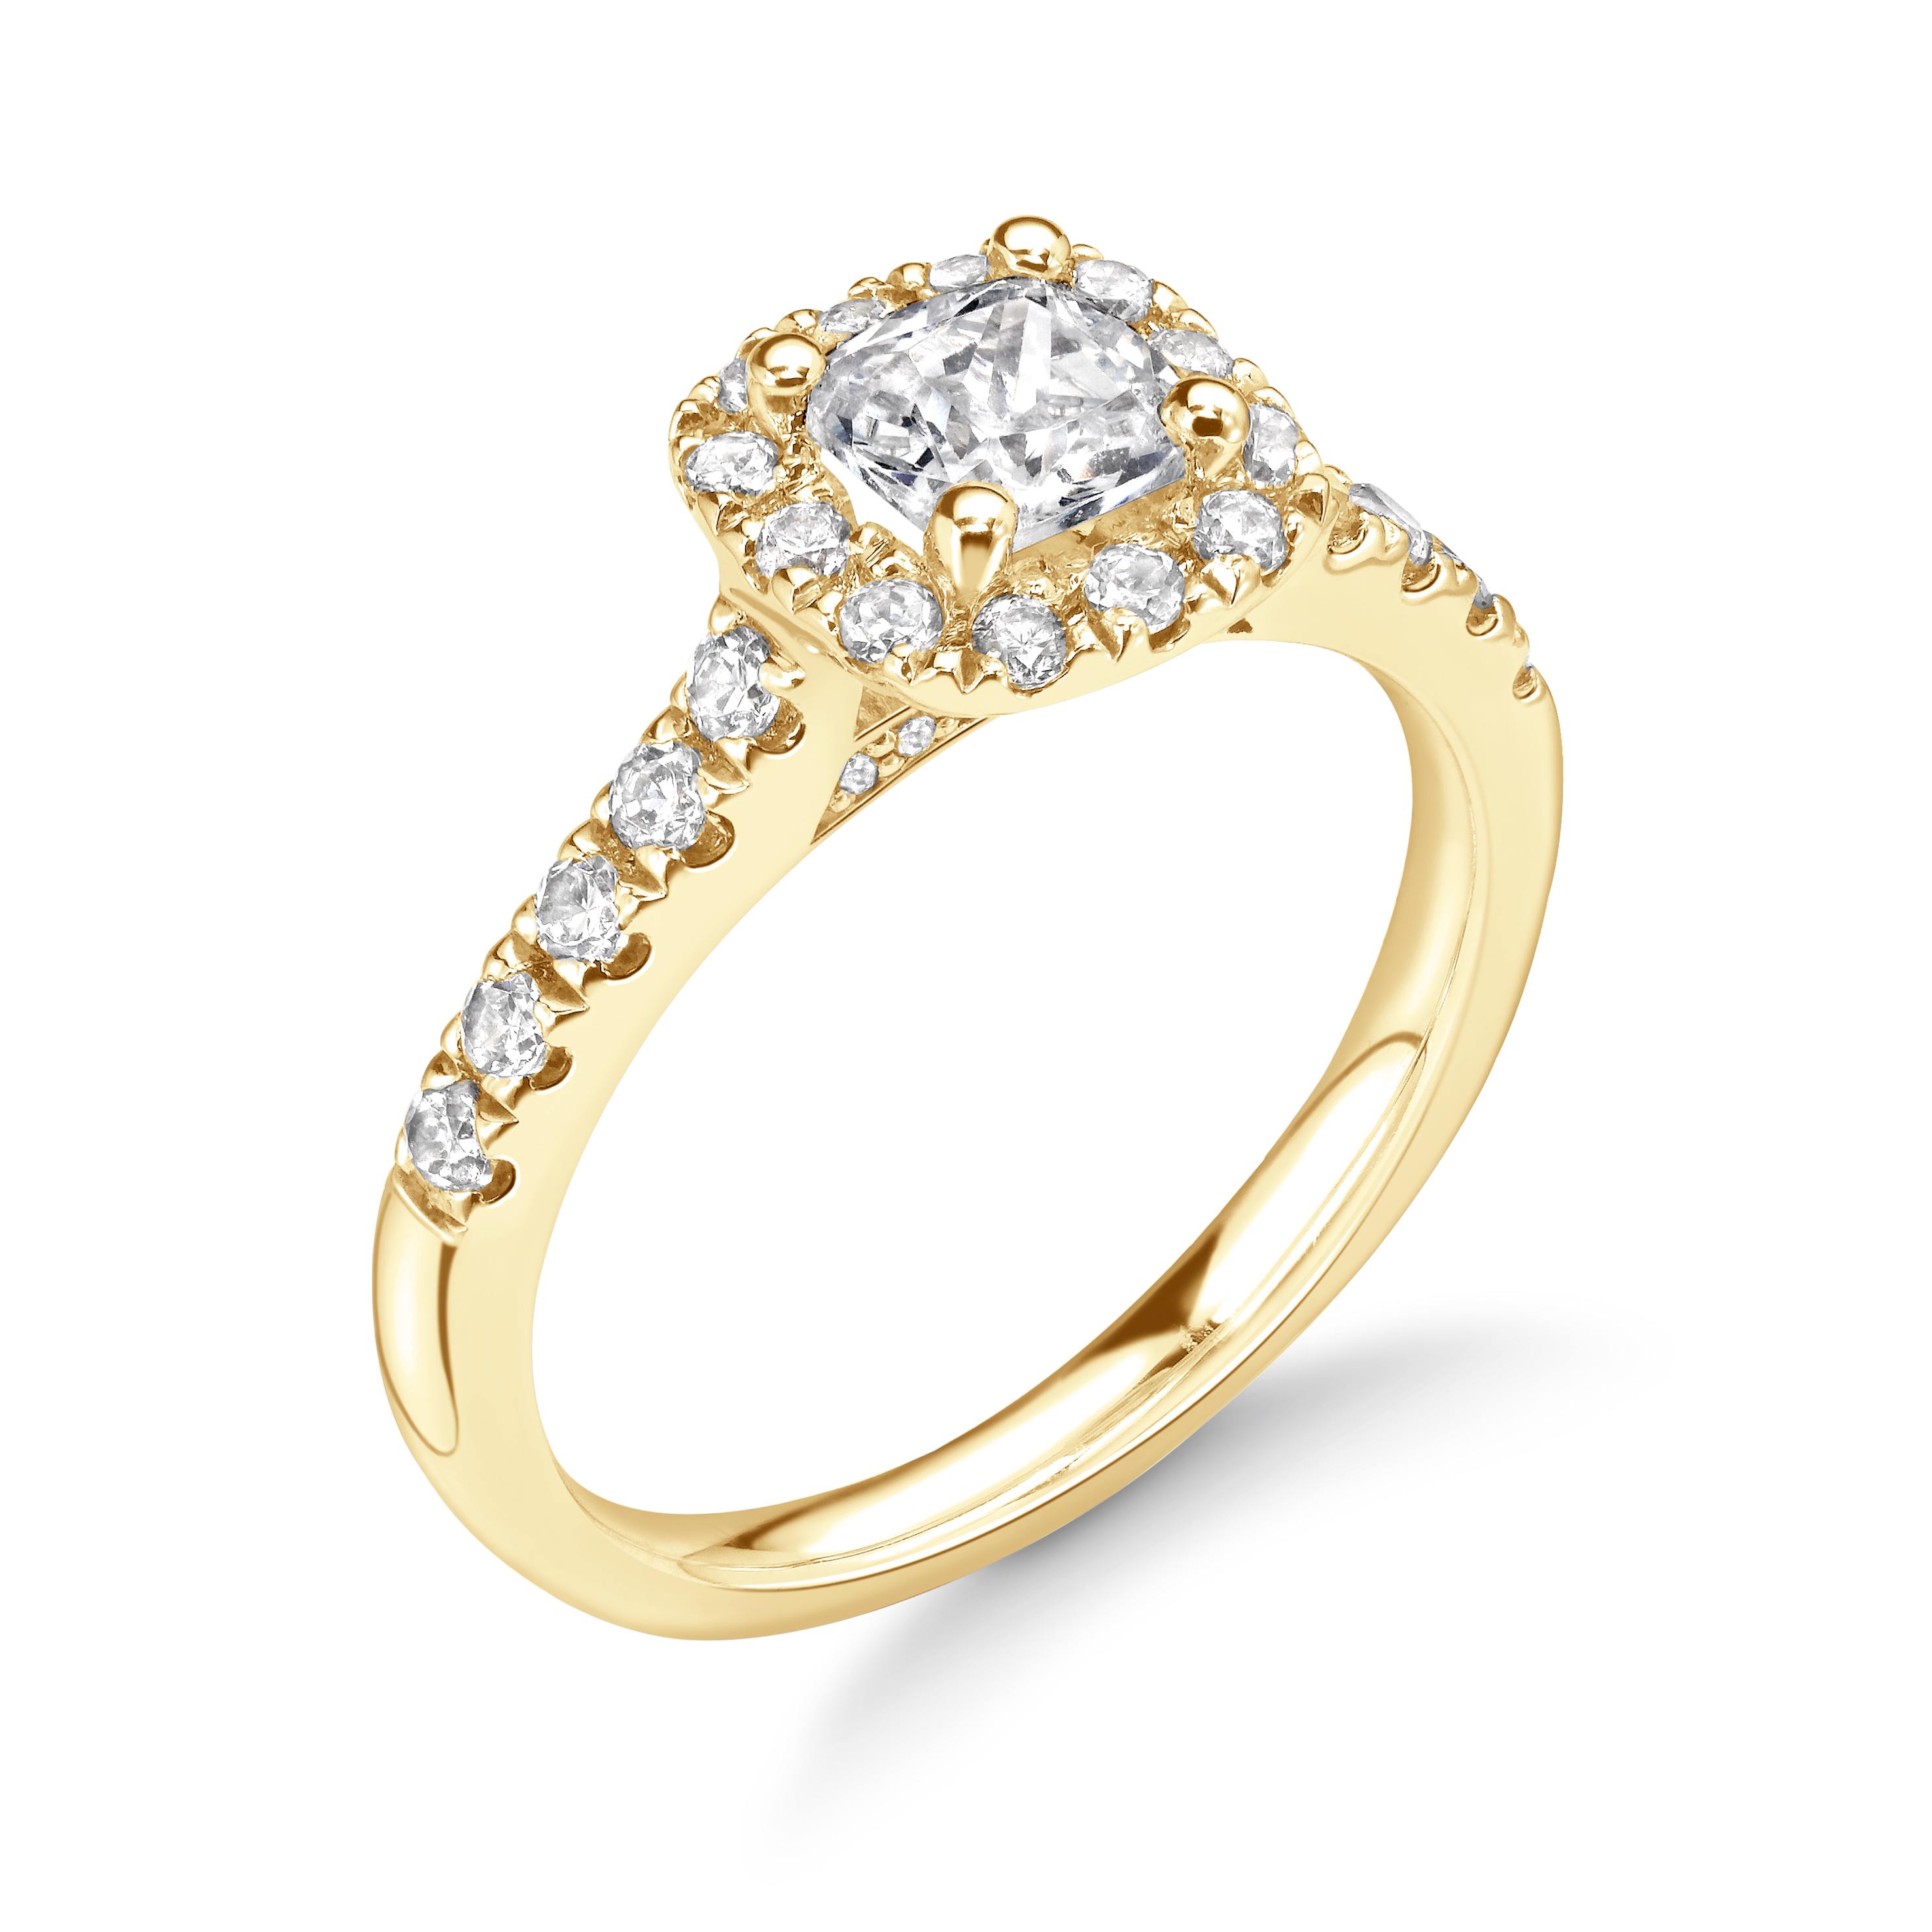 4 Prong Setting Asscher Shape Open Setting Halo Diamond Engagement Rings